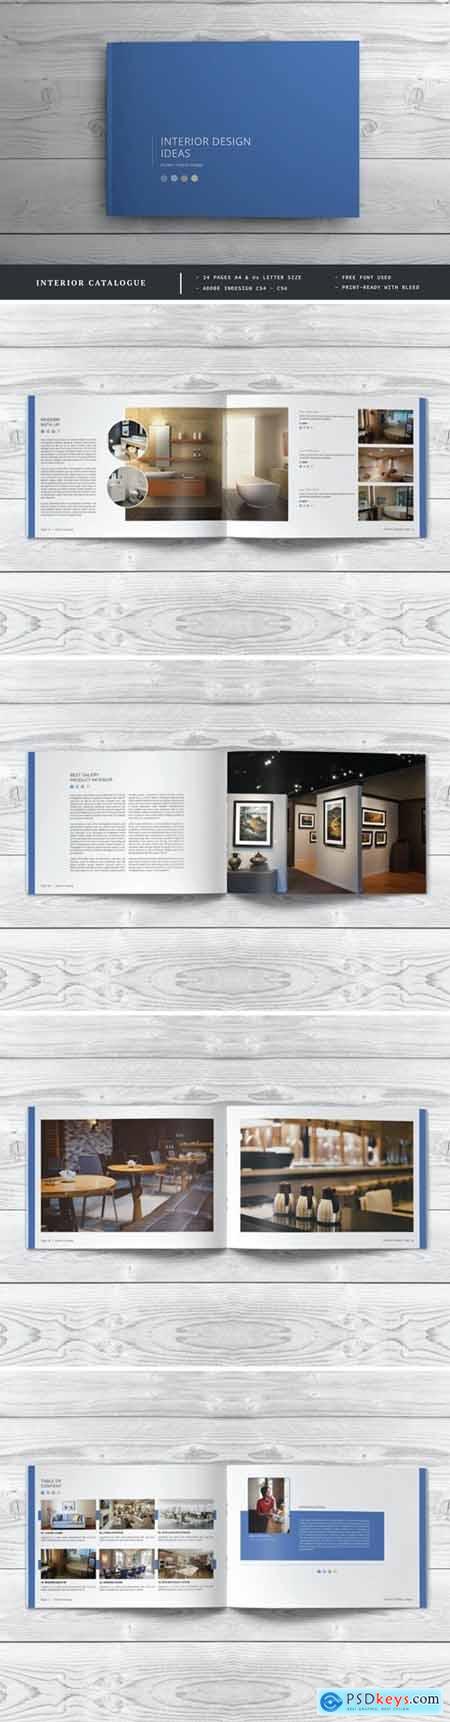 Interior design Brochure - Catalog Template